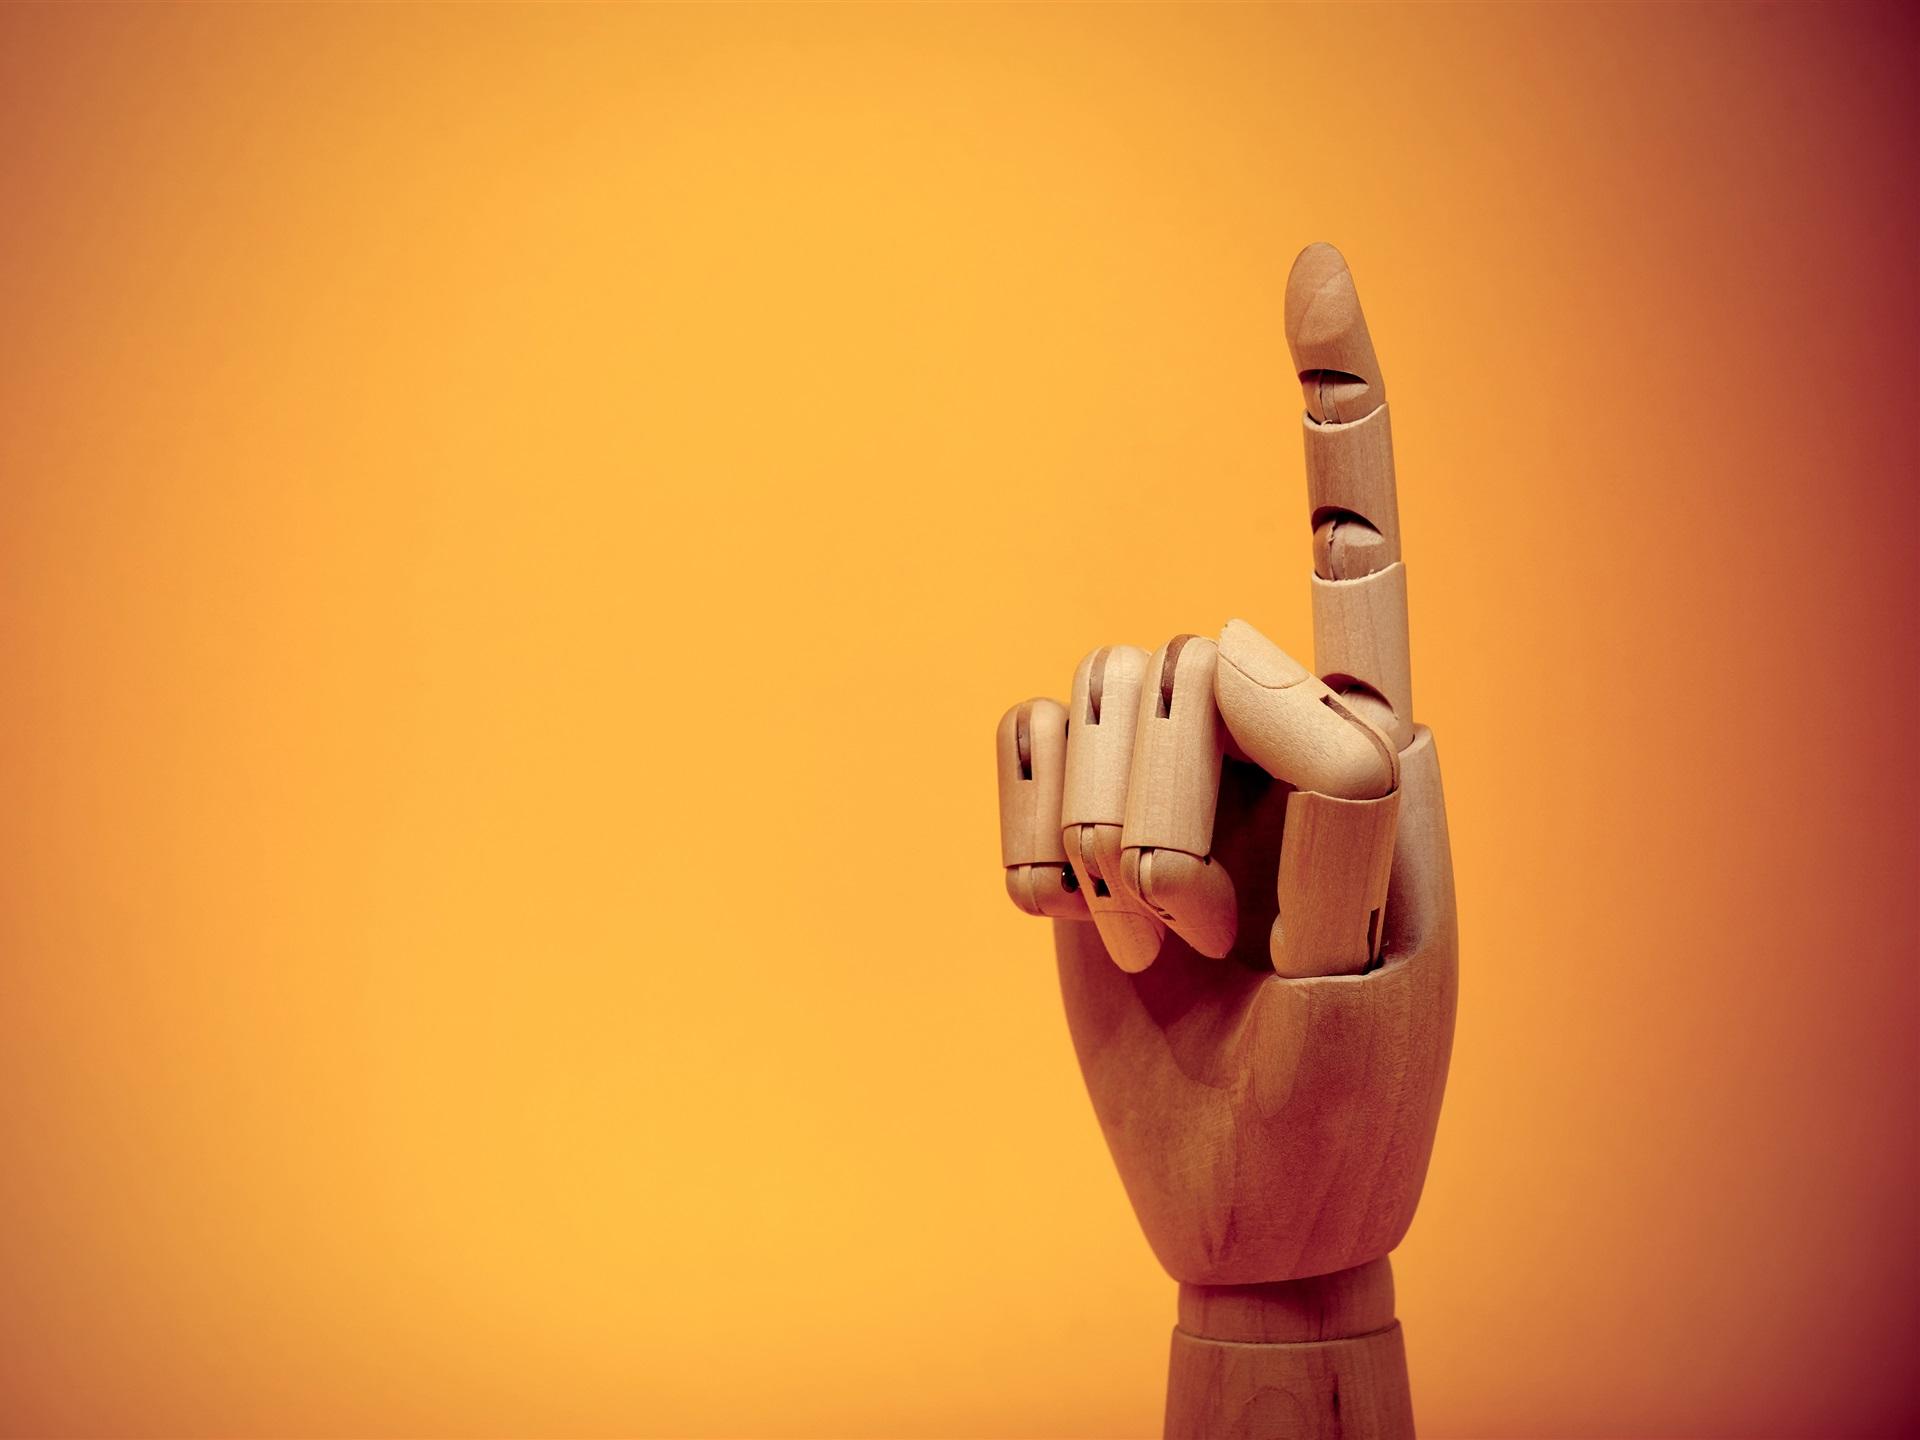 Fingergeste Hölzerne Kunstwerke 3840x2160 Uhd 4k